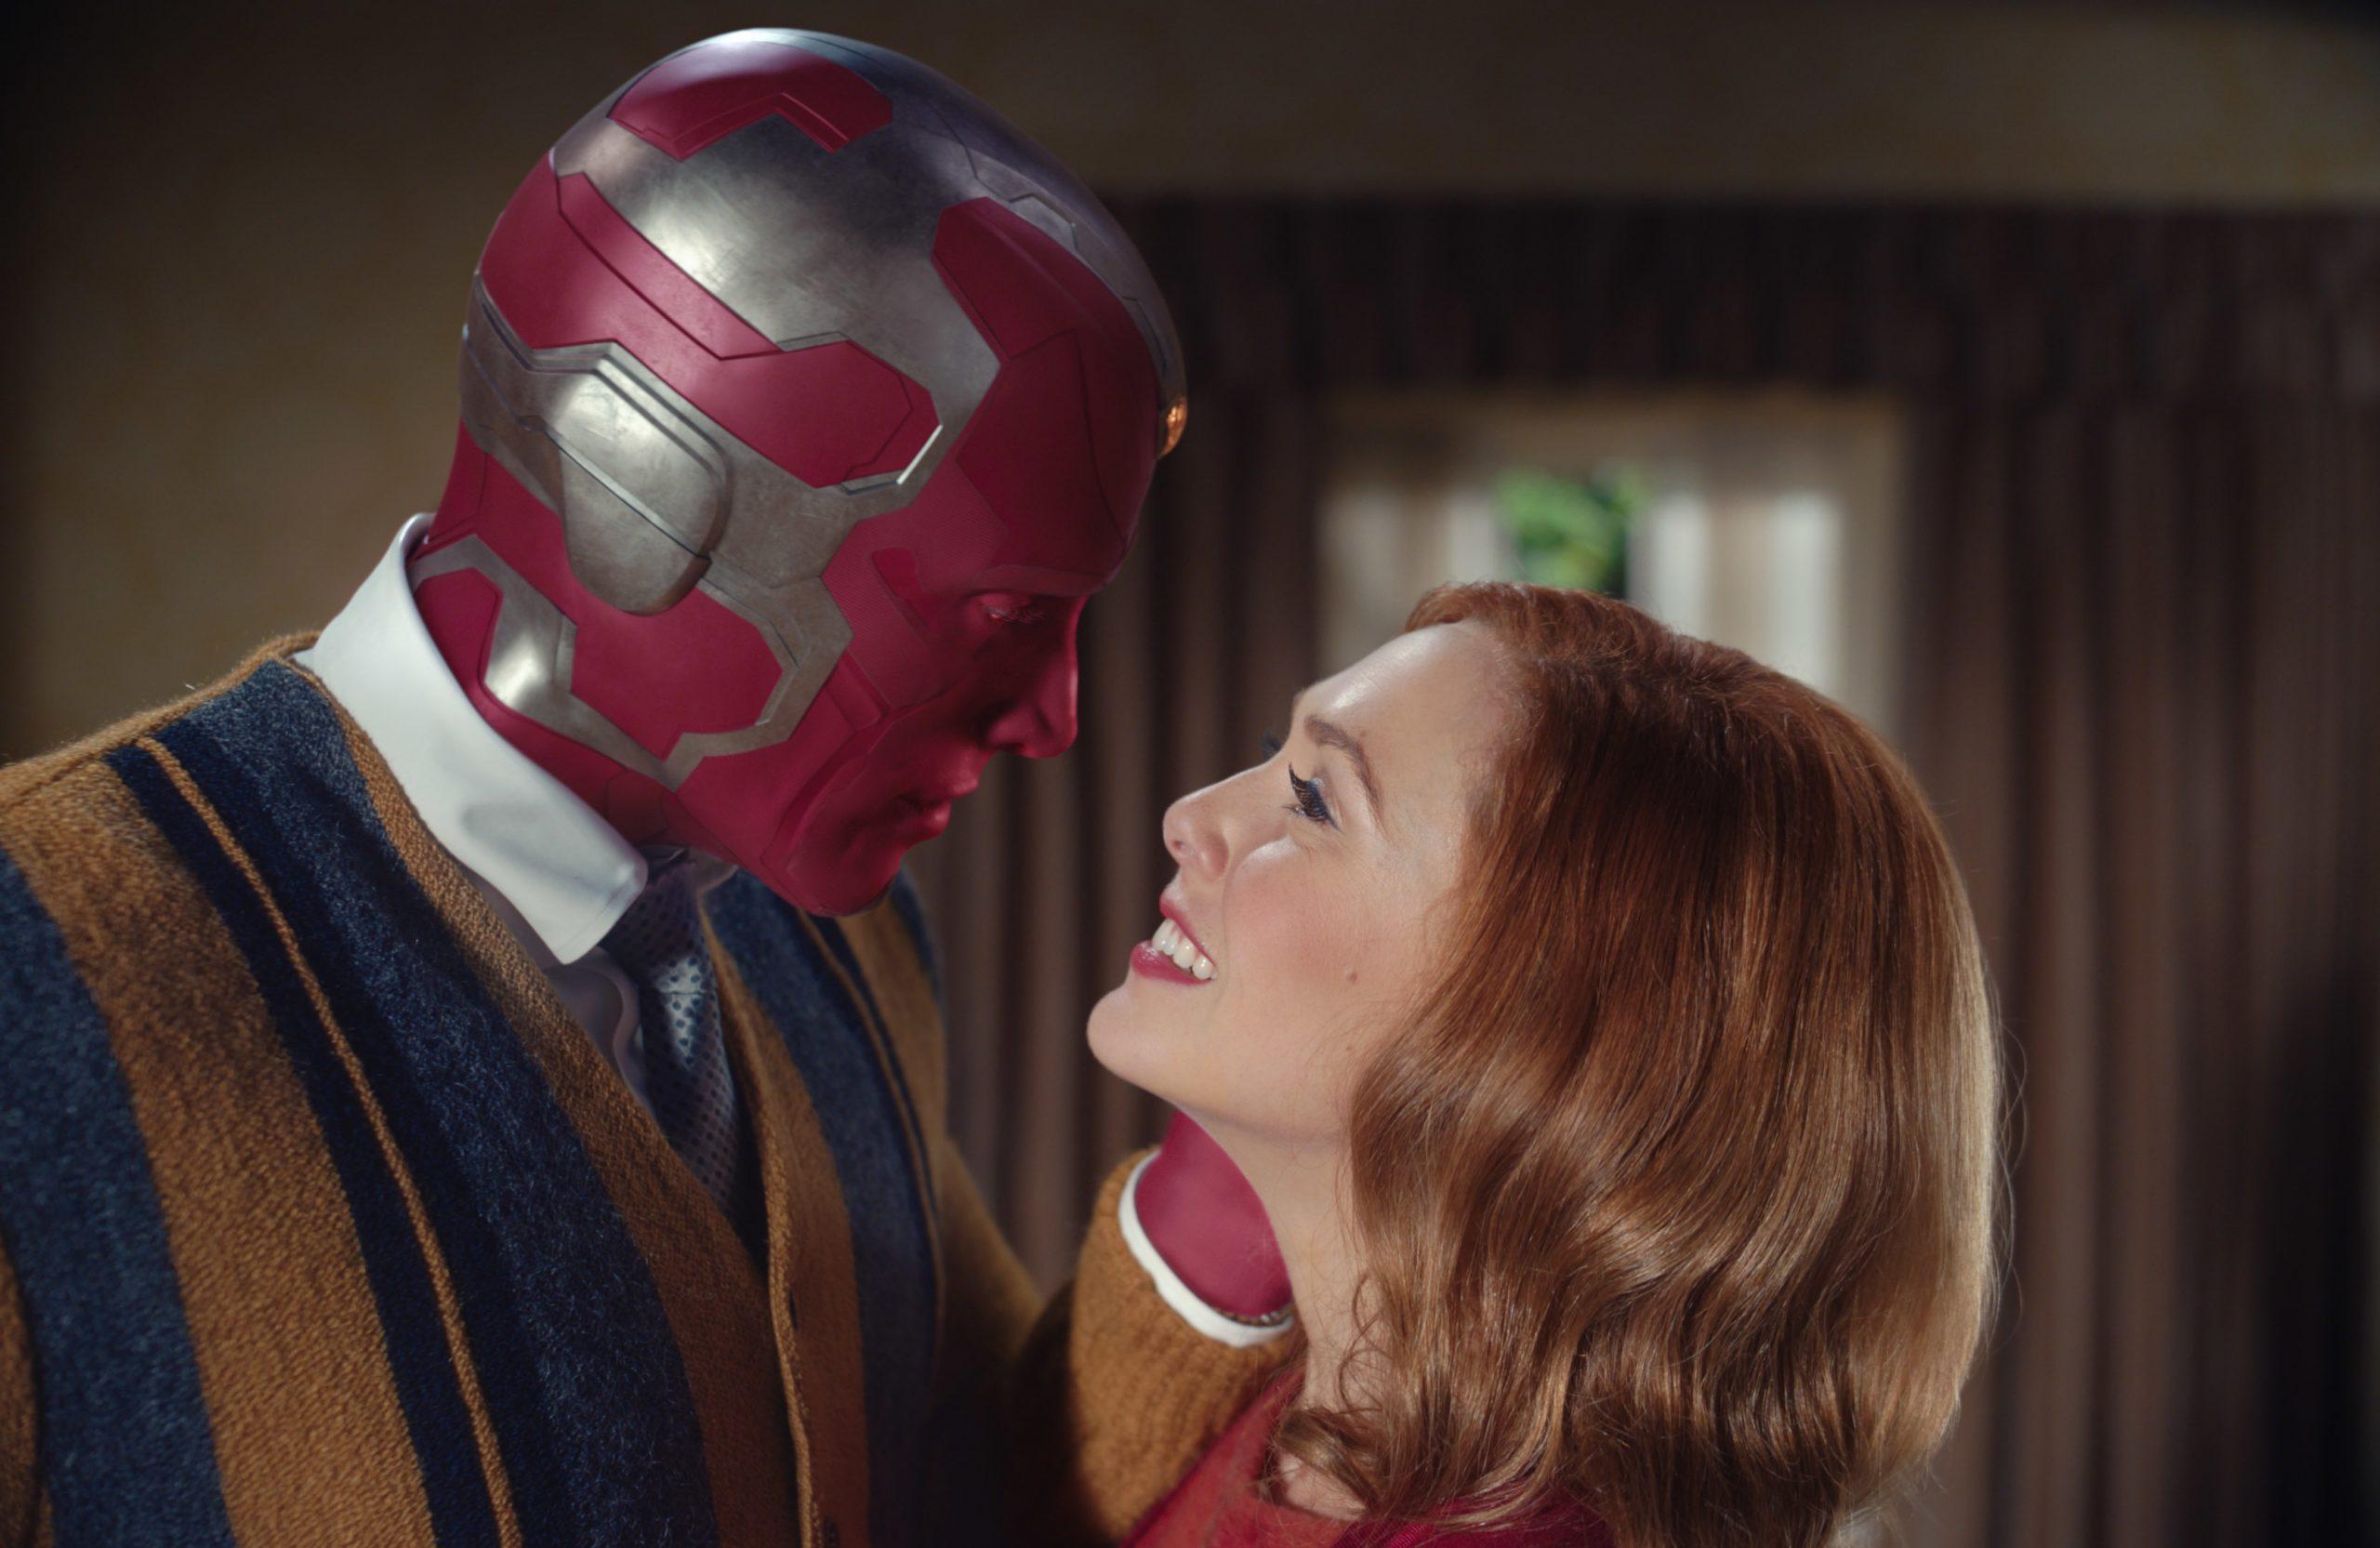 Paul Bettany as Vision and Elizabeth Olsen as Wanda Maximoff in 'WandaVision